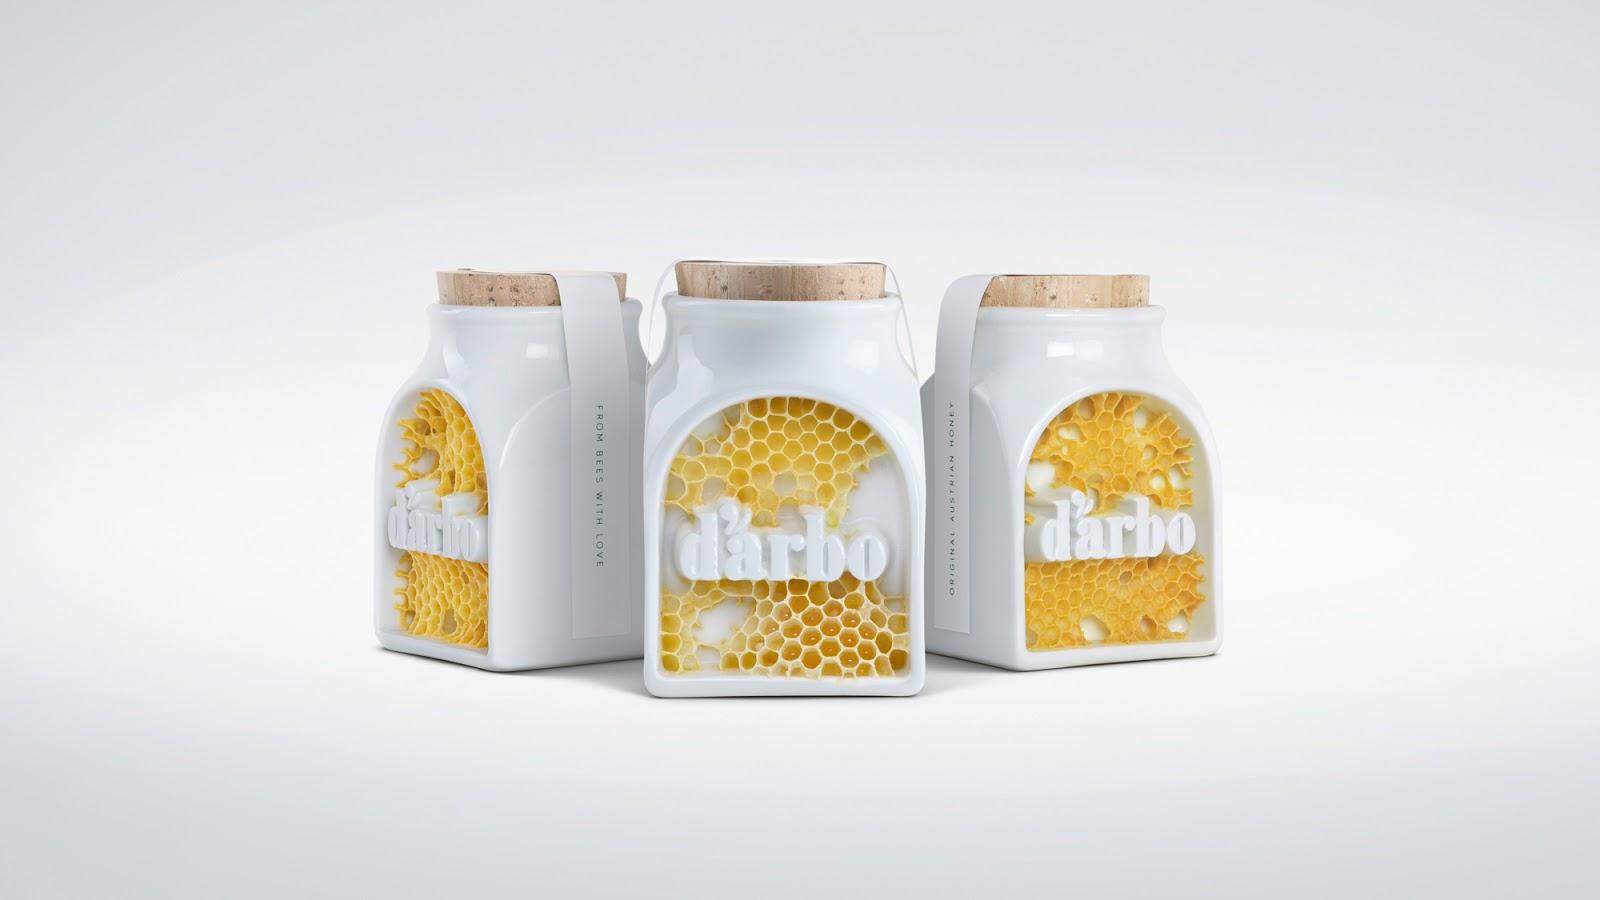 Darbo - Signed by Bees瓷罐蜂蜜包装创意设计